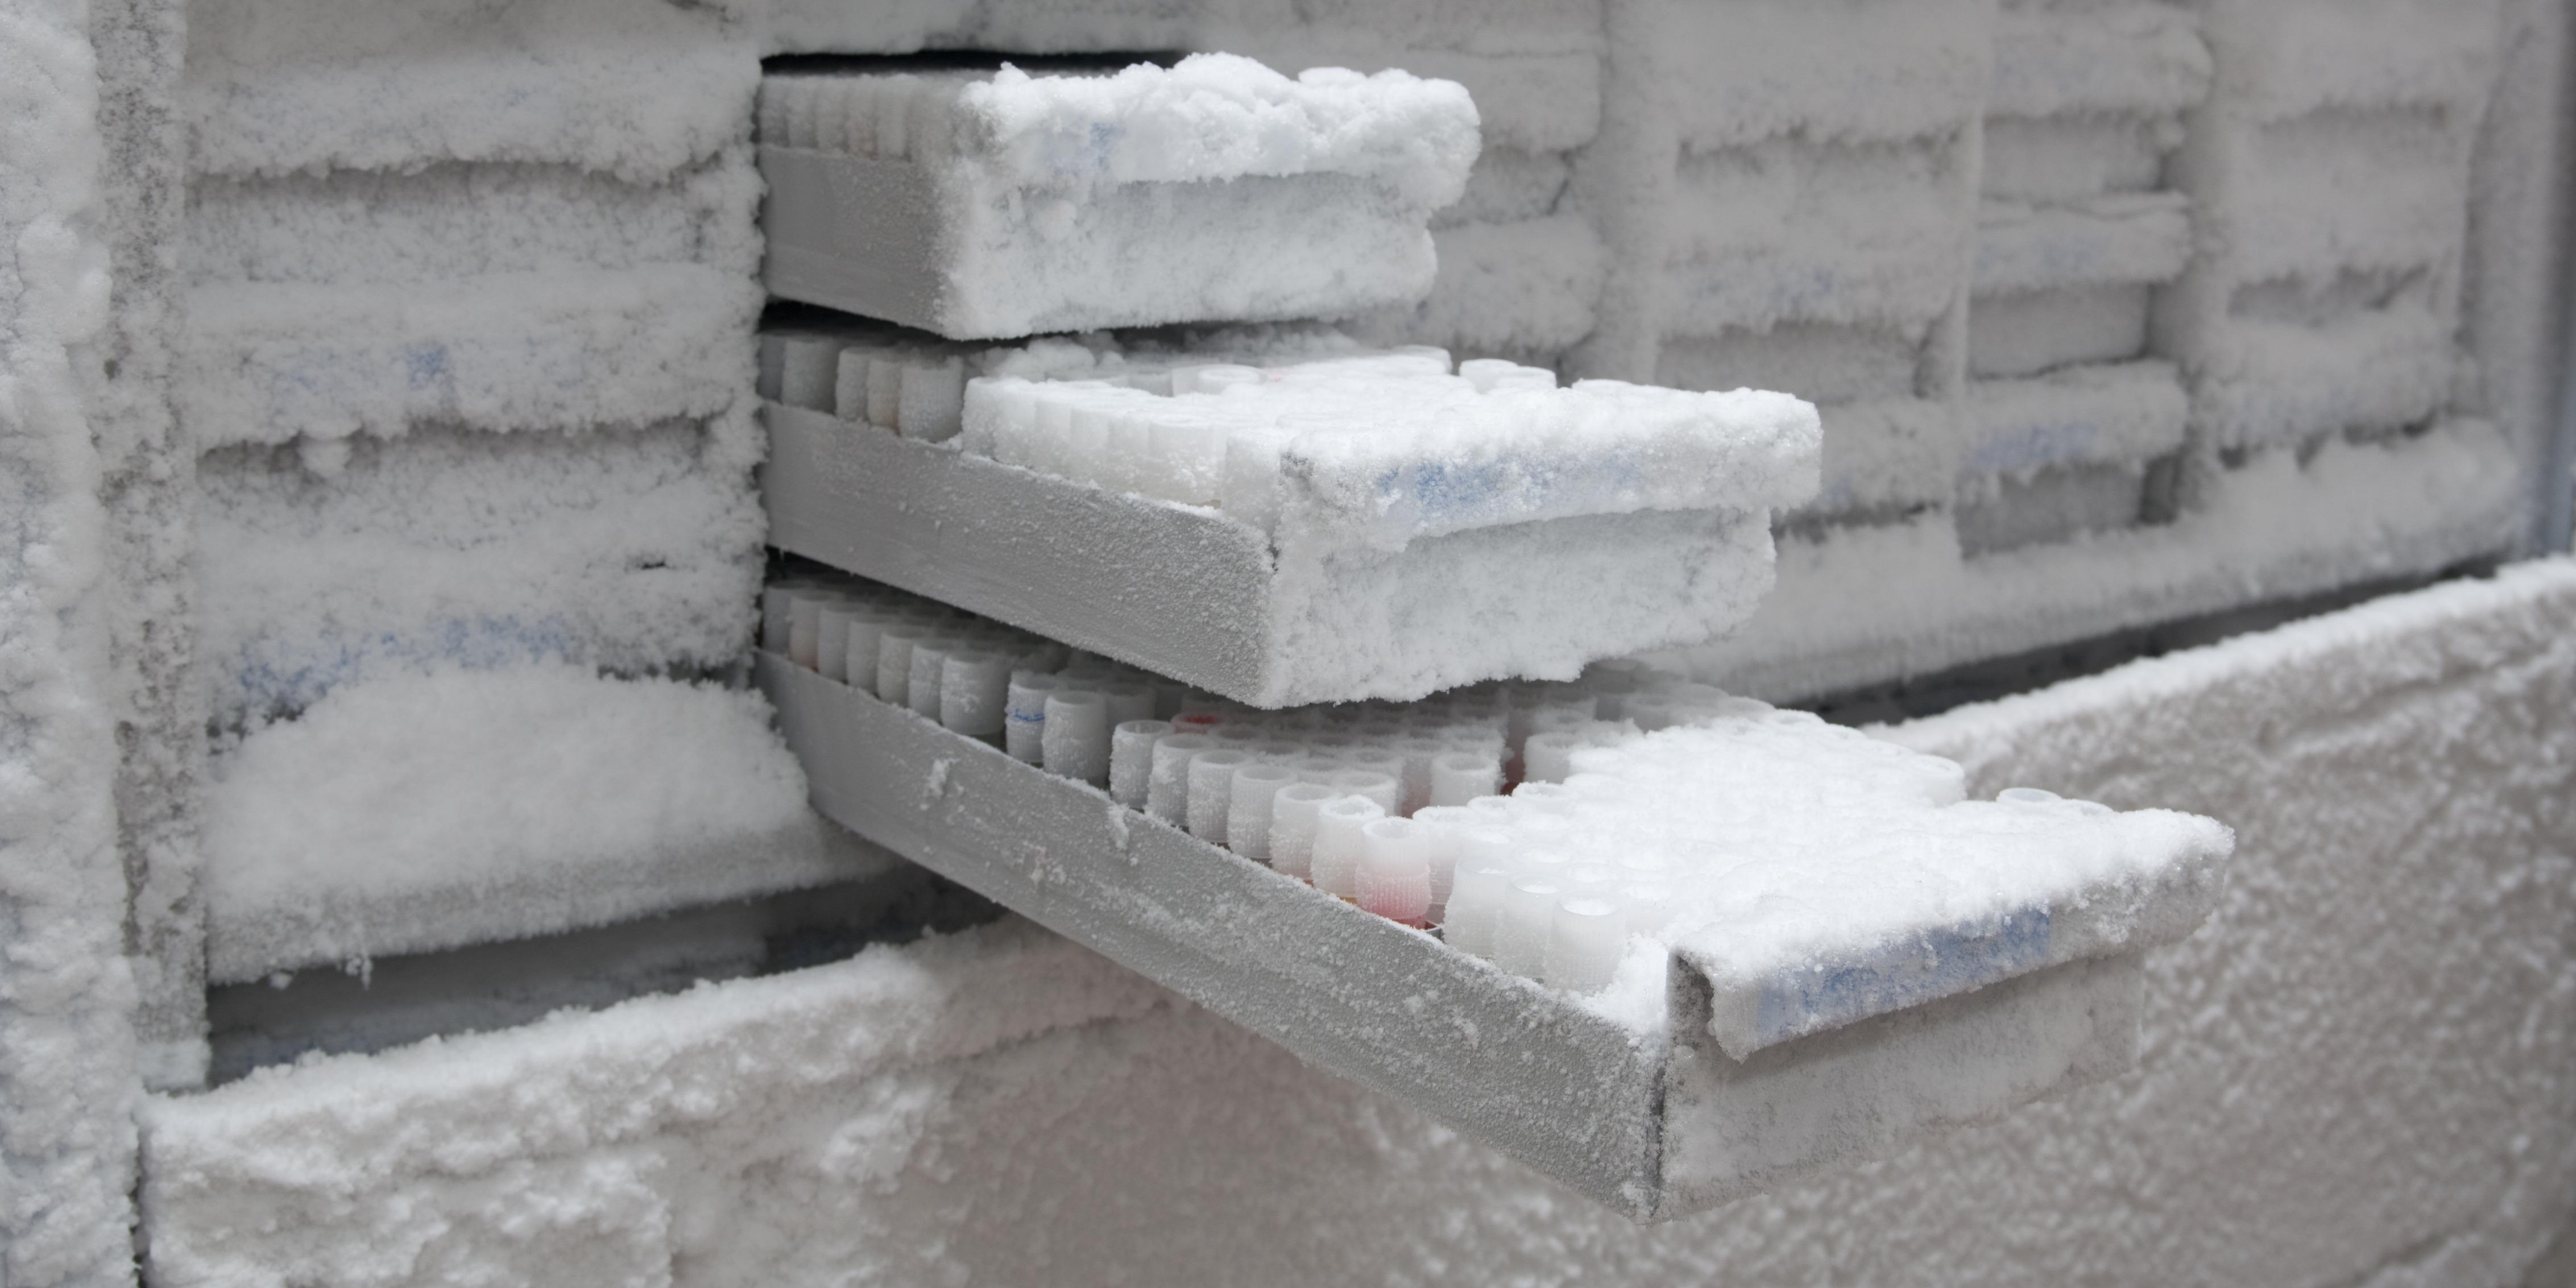 laboratory-freezer-inventory